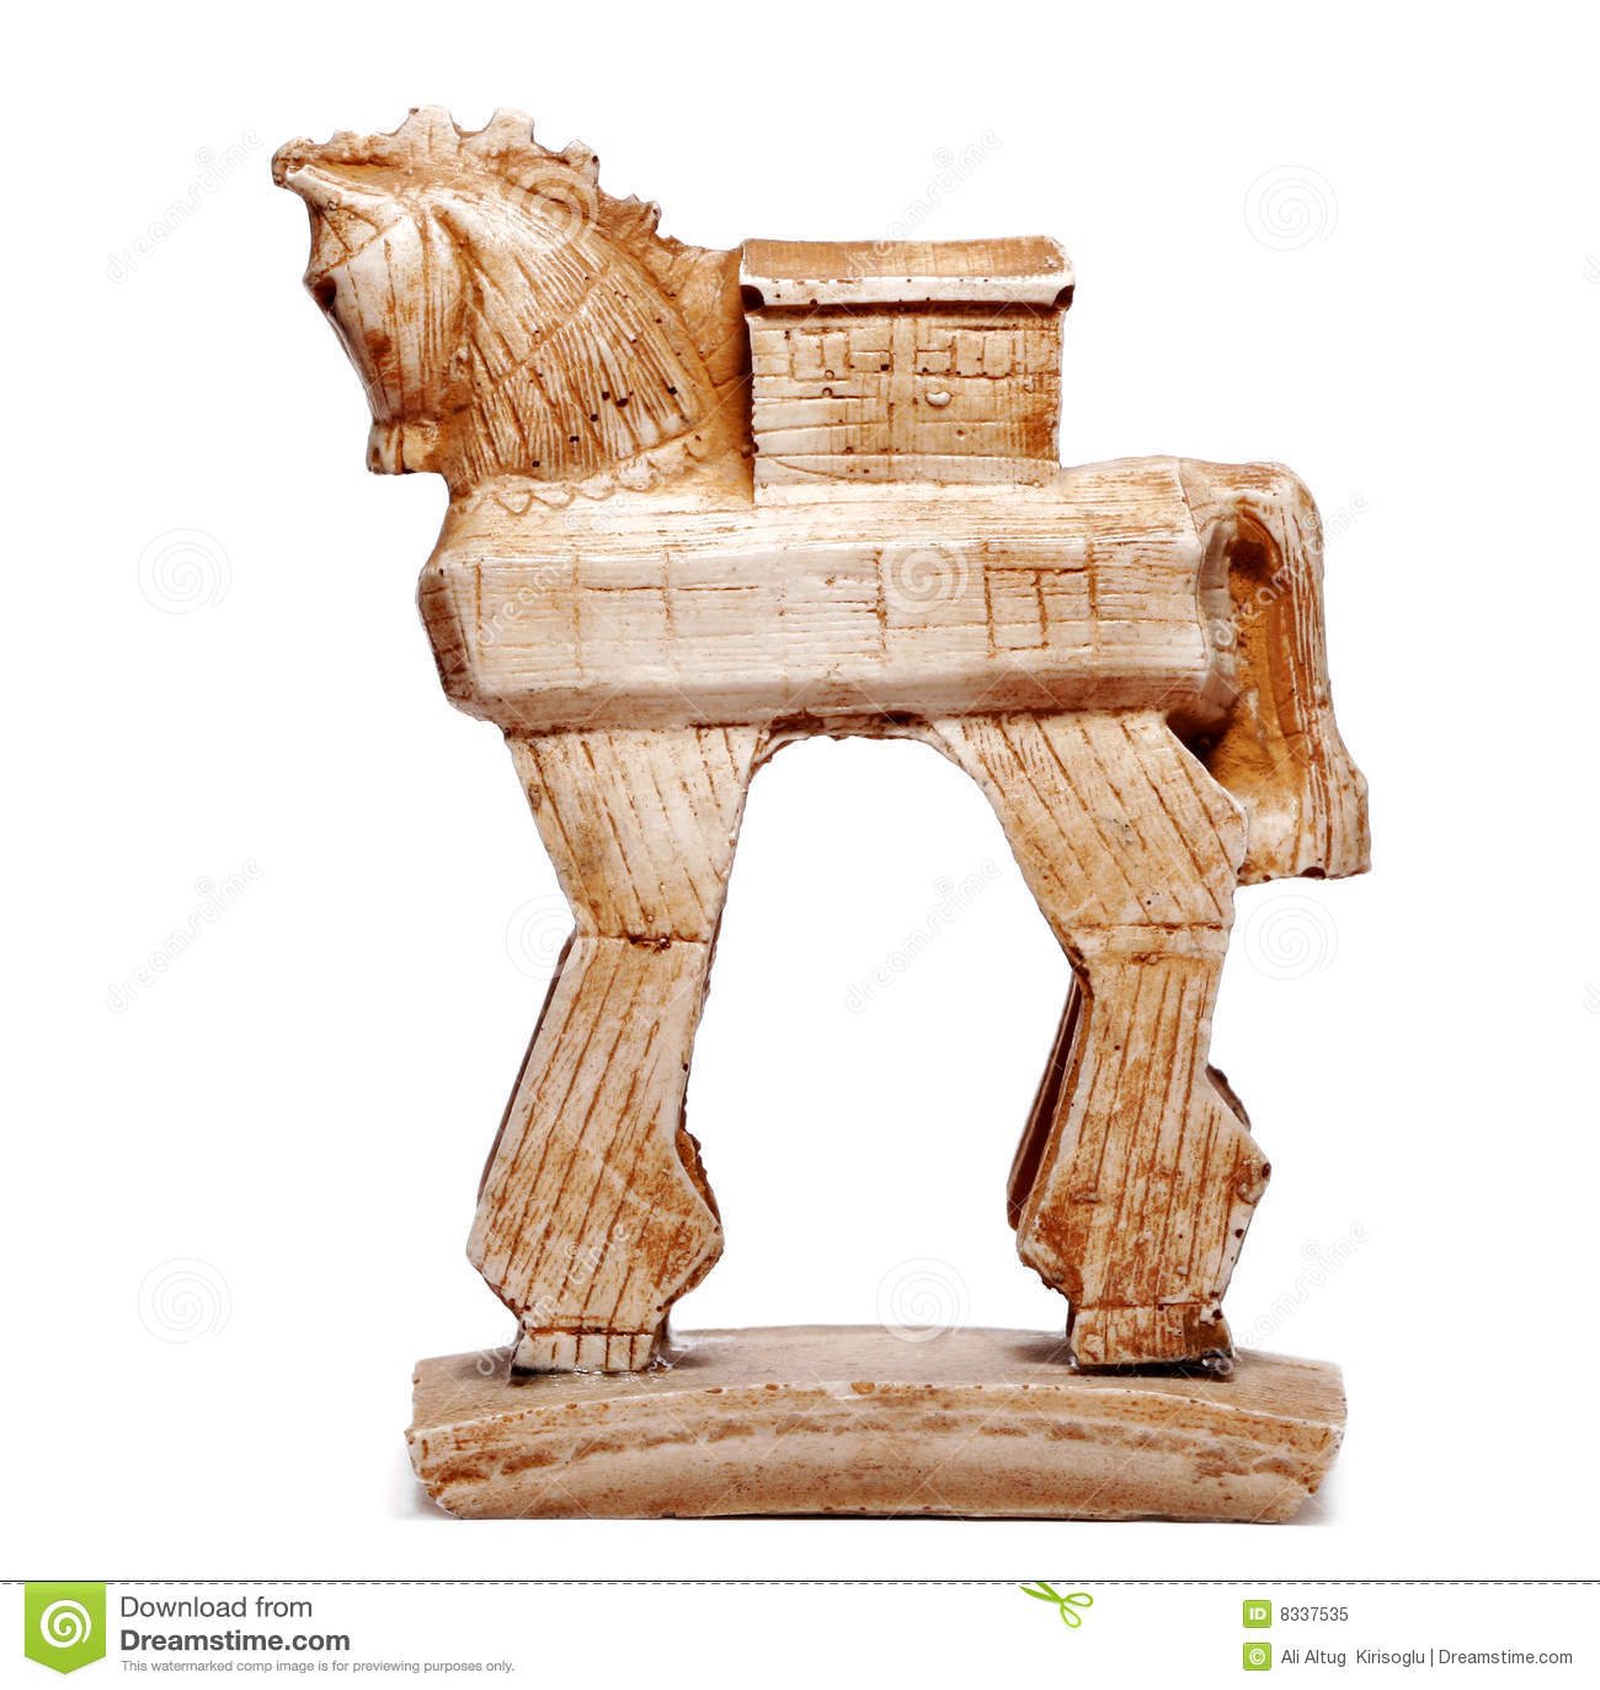 trojan horse figurine bibelot royalty free stock photo image 8337535. Black Bedroom Furniture Sets. Home Design Ideas